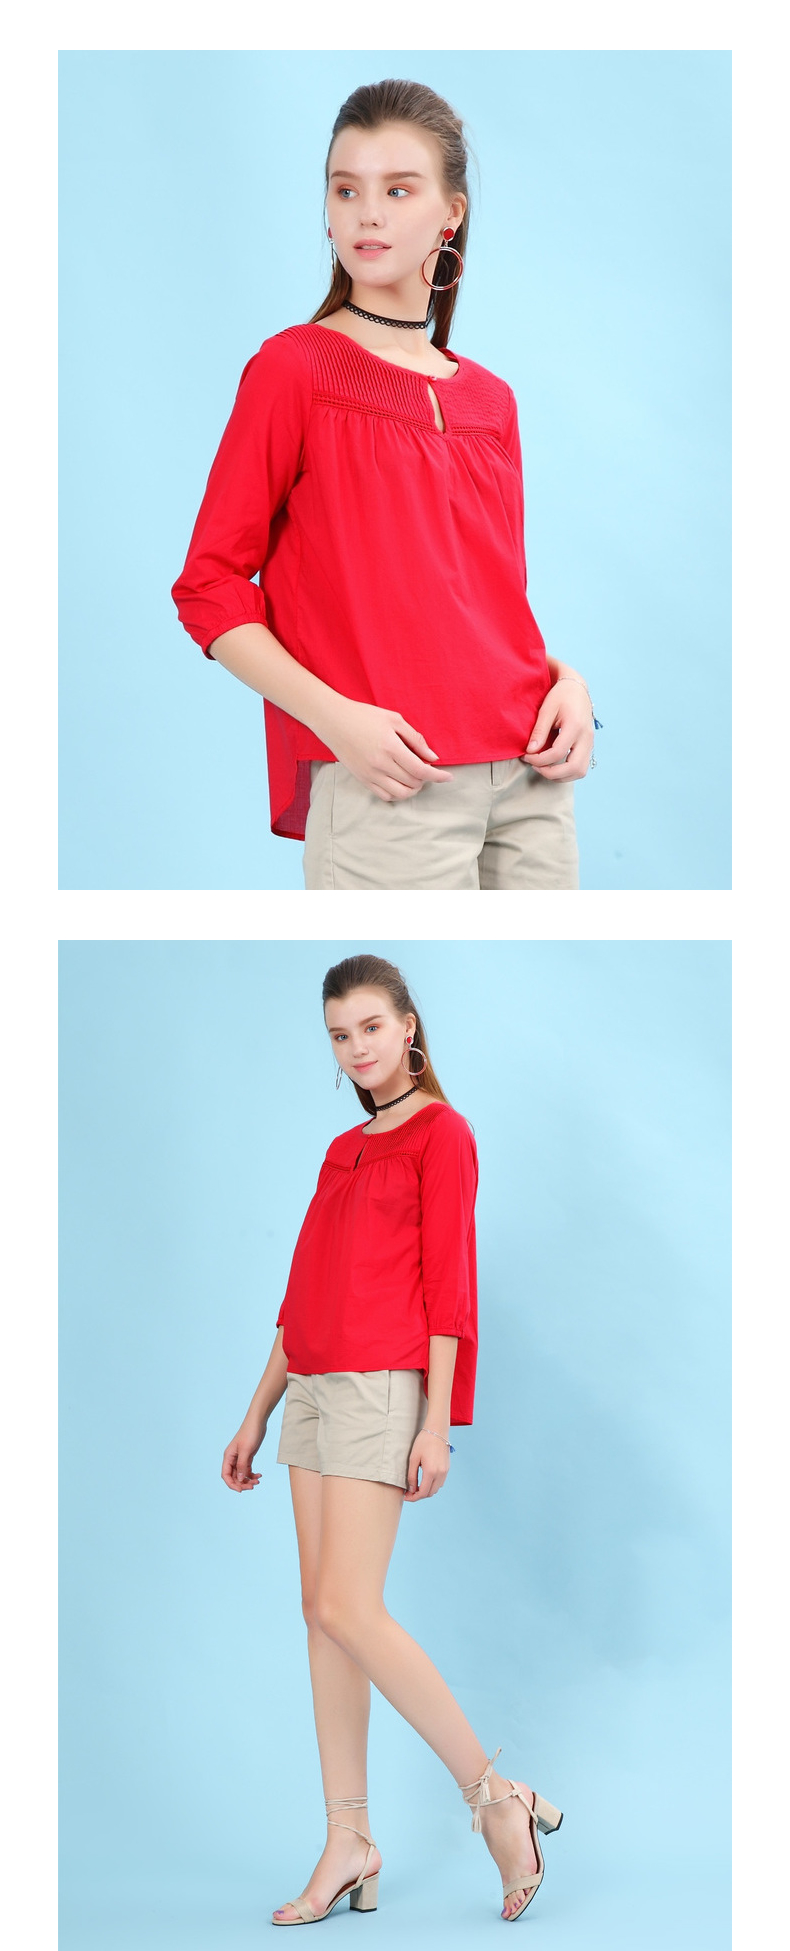 Quần áo nữ Bossini  23795 - ảnh 11